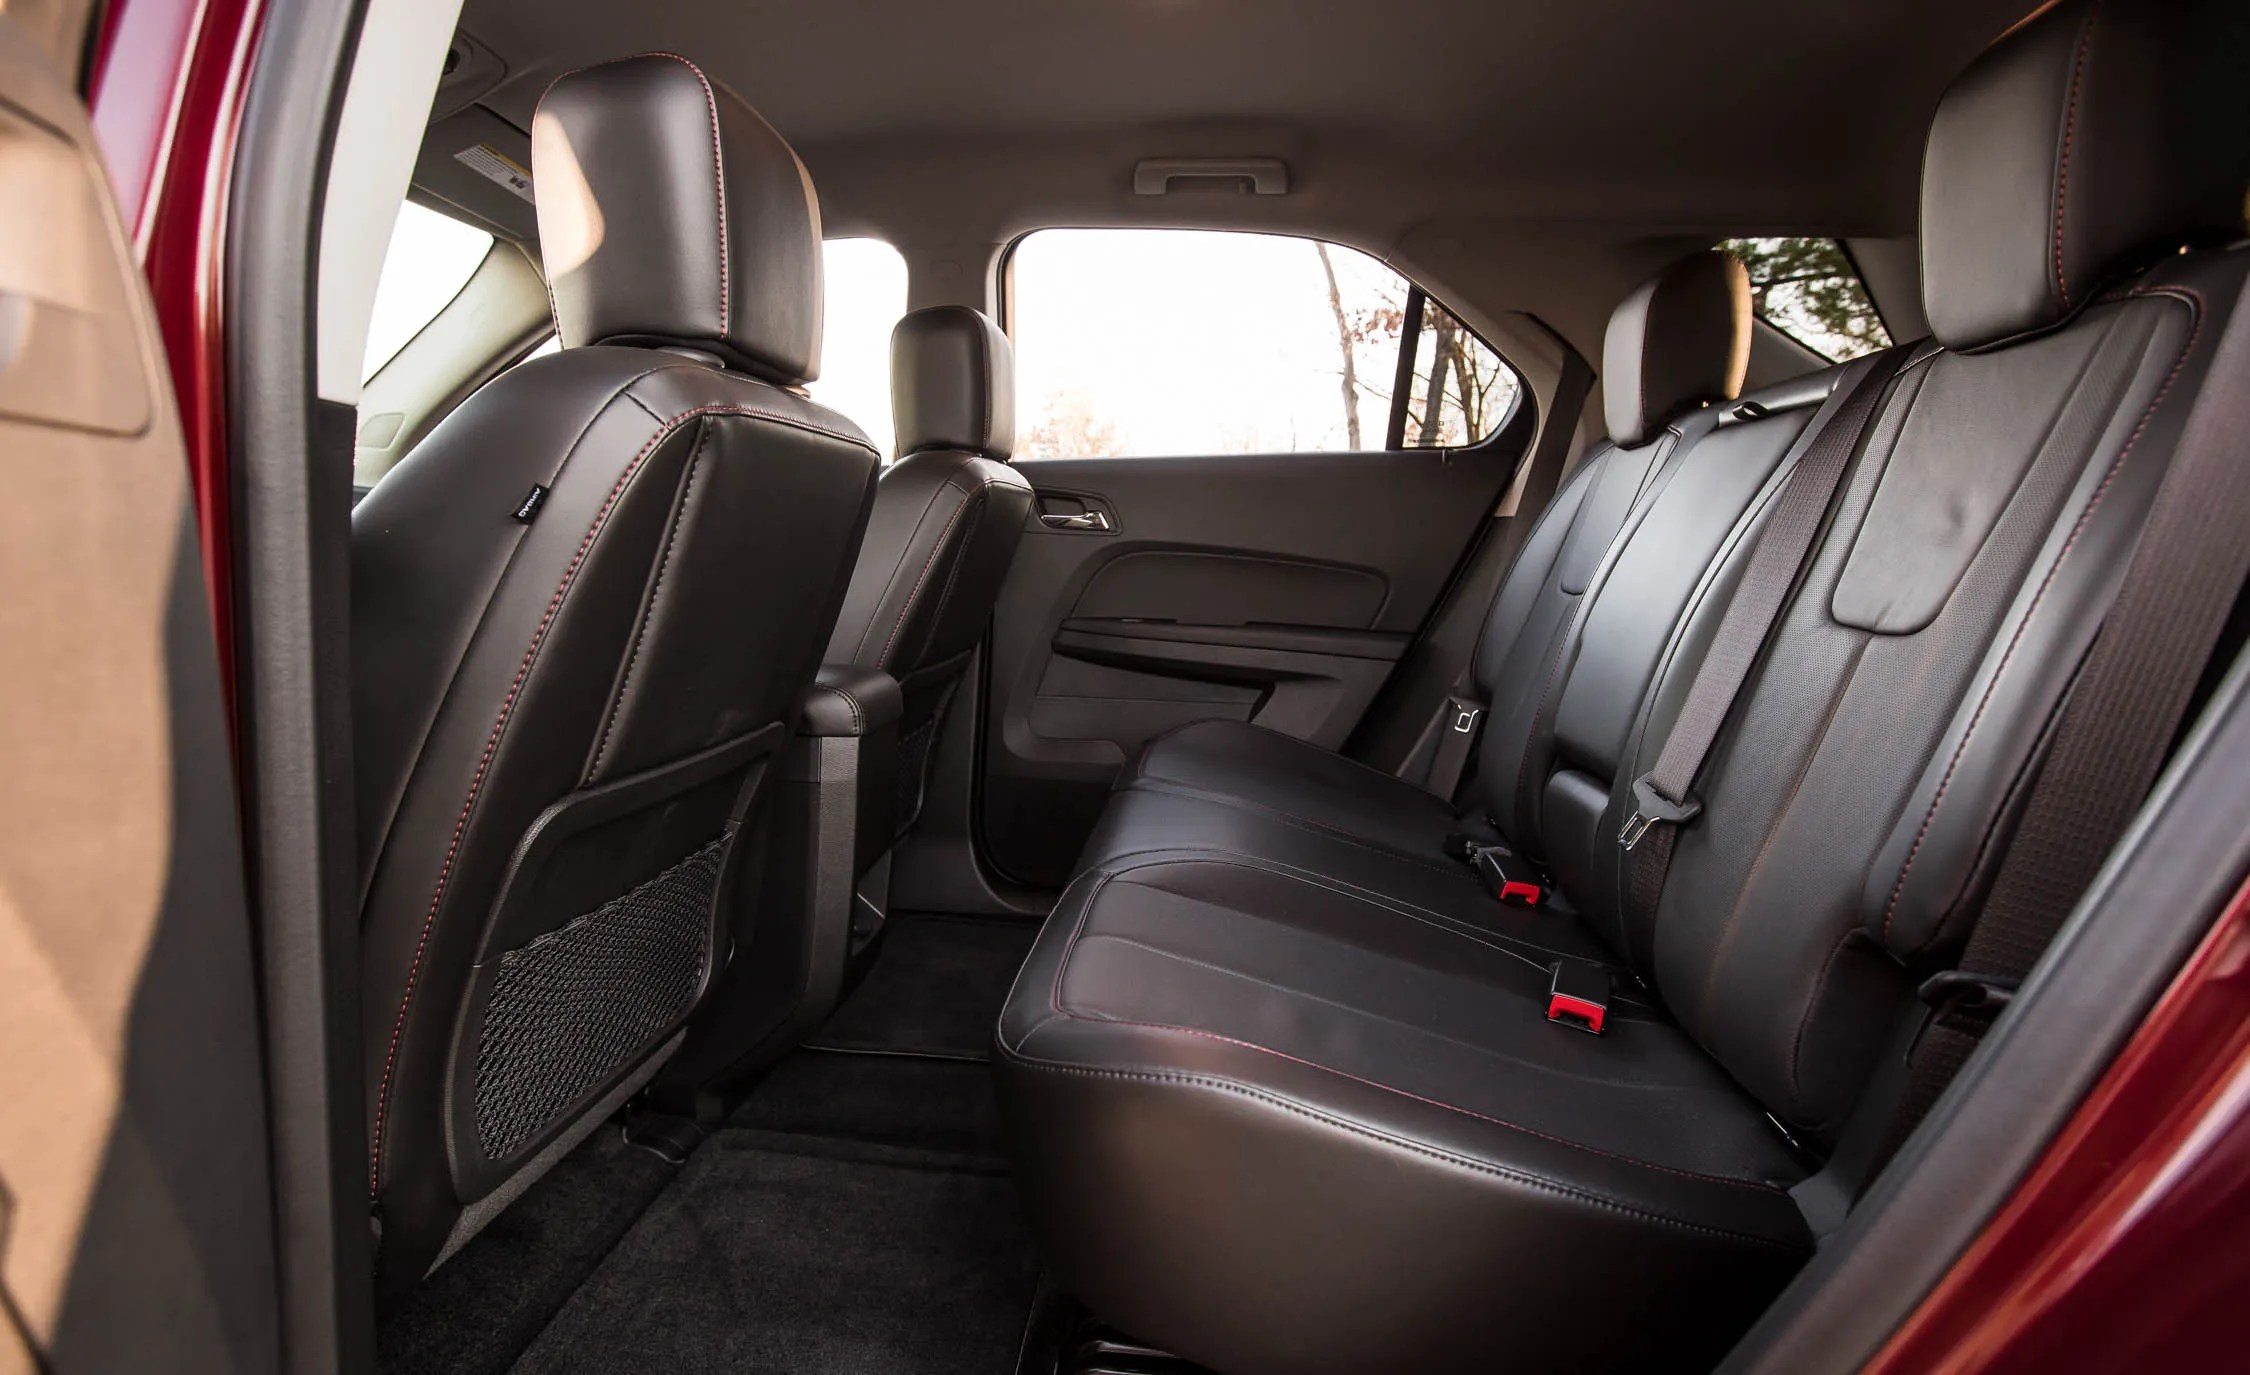 2016 Chevrolet Equinox LTZ Interior Rear Passenger Space